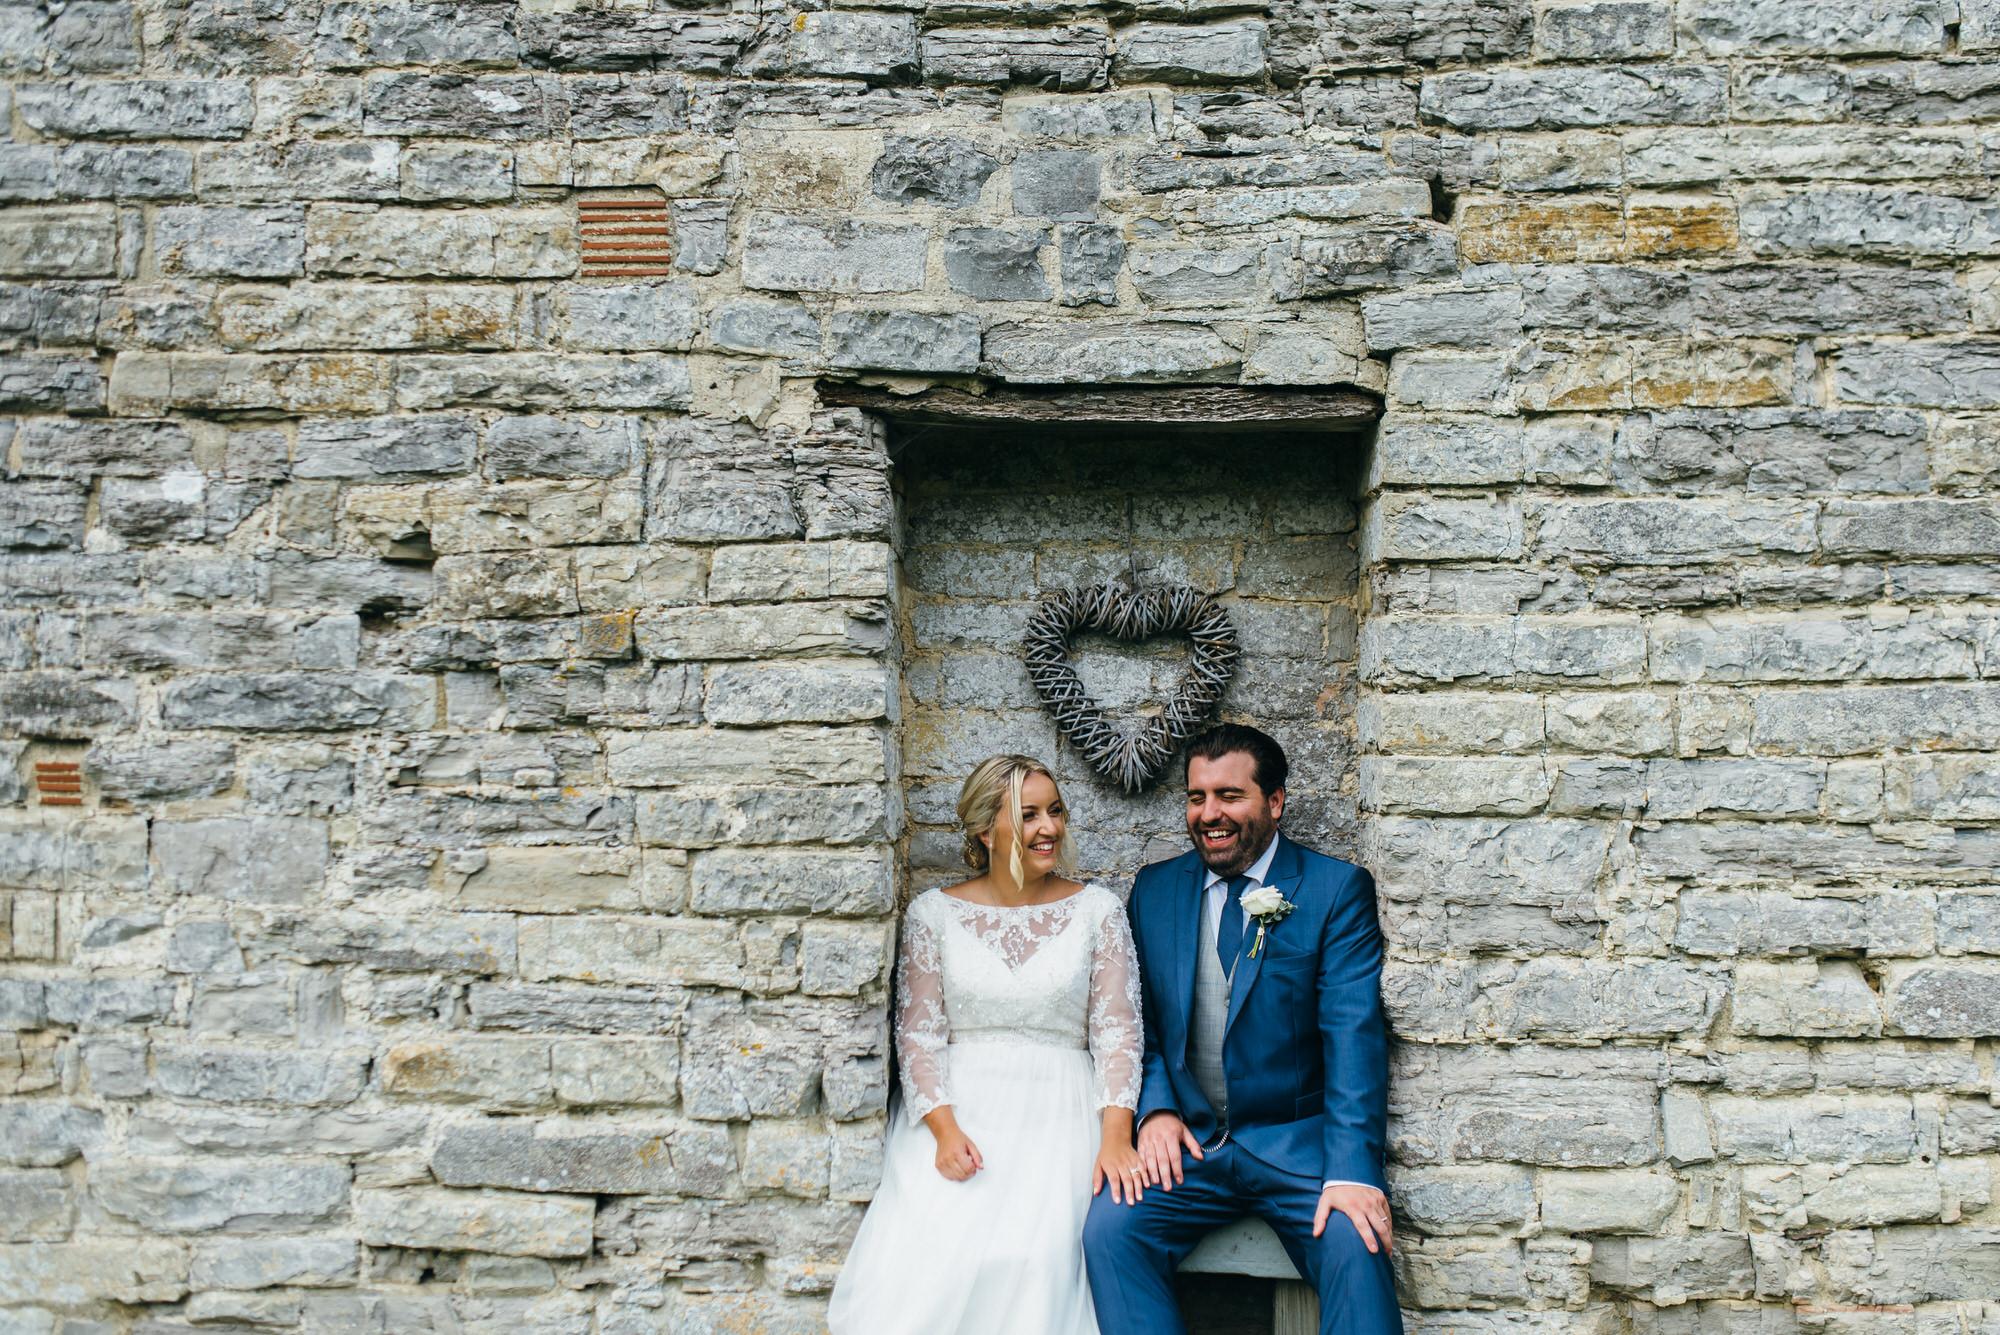 Newlyweds at Almonry barn wedding